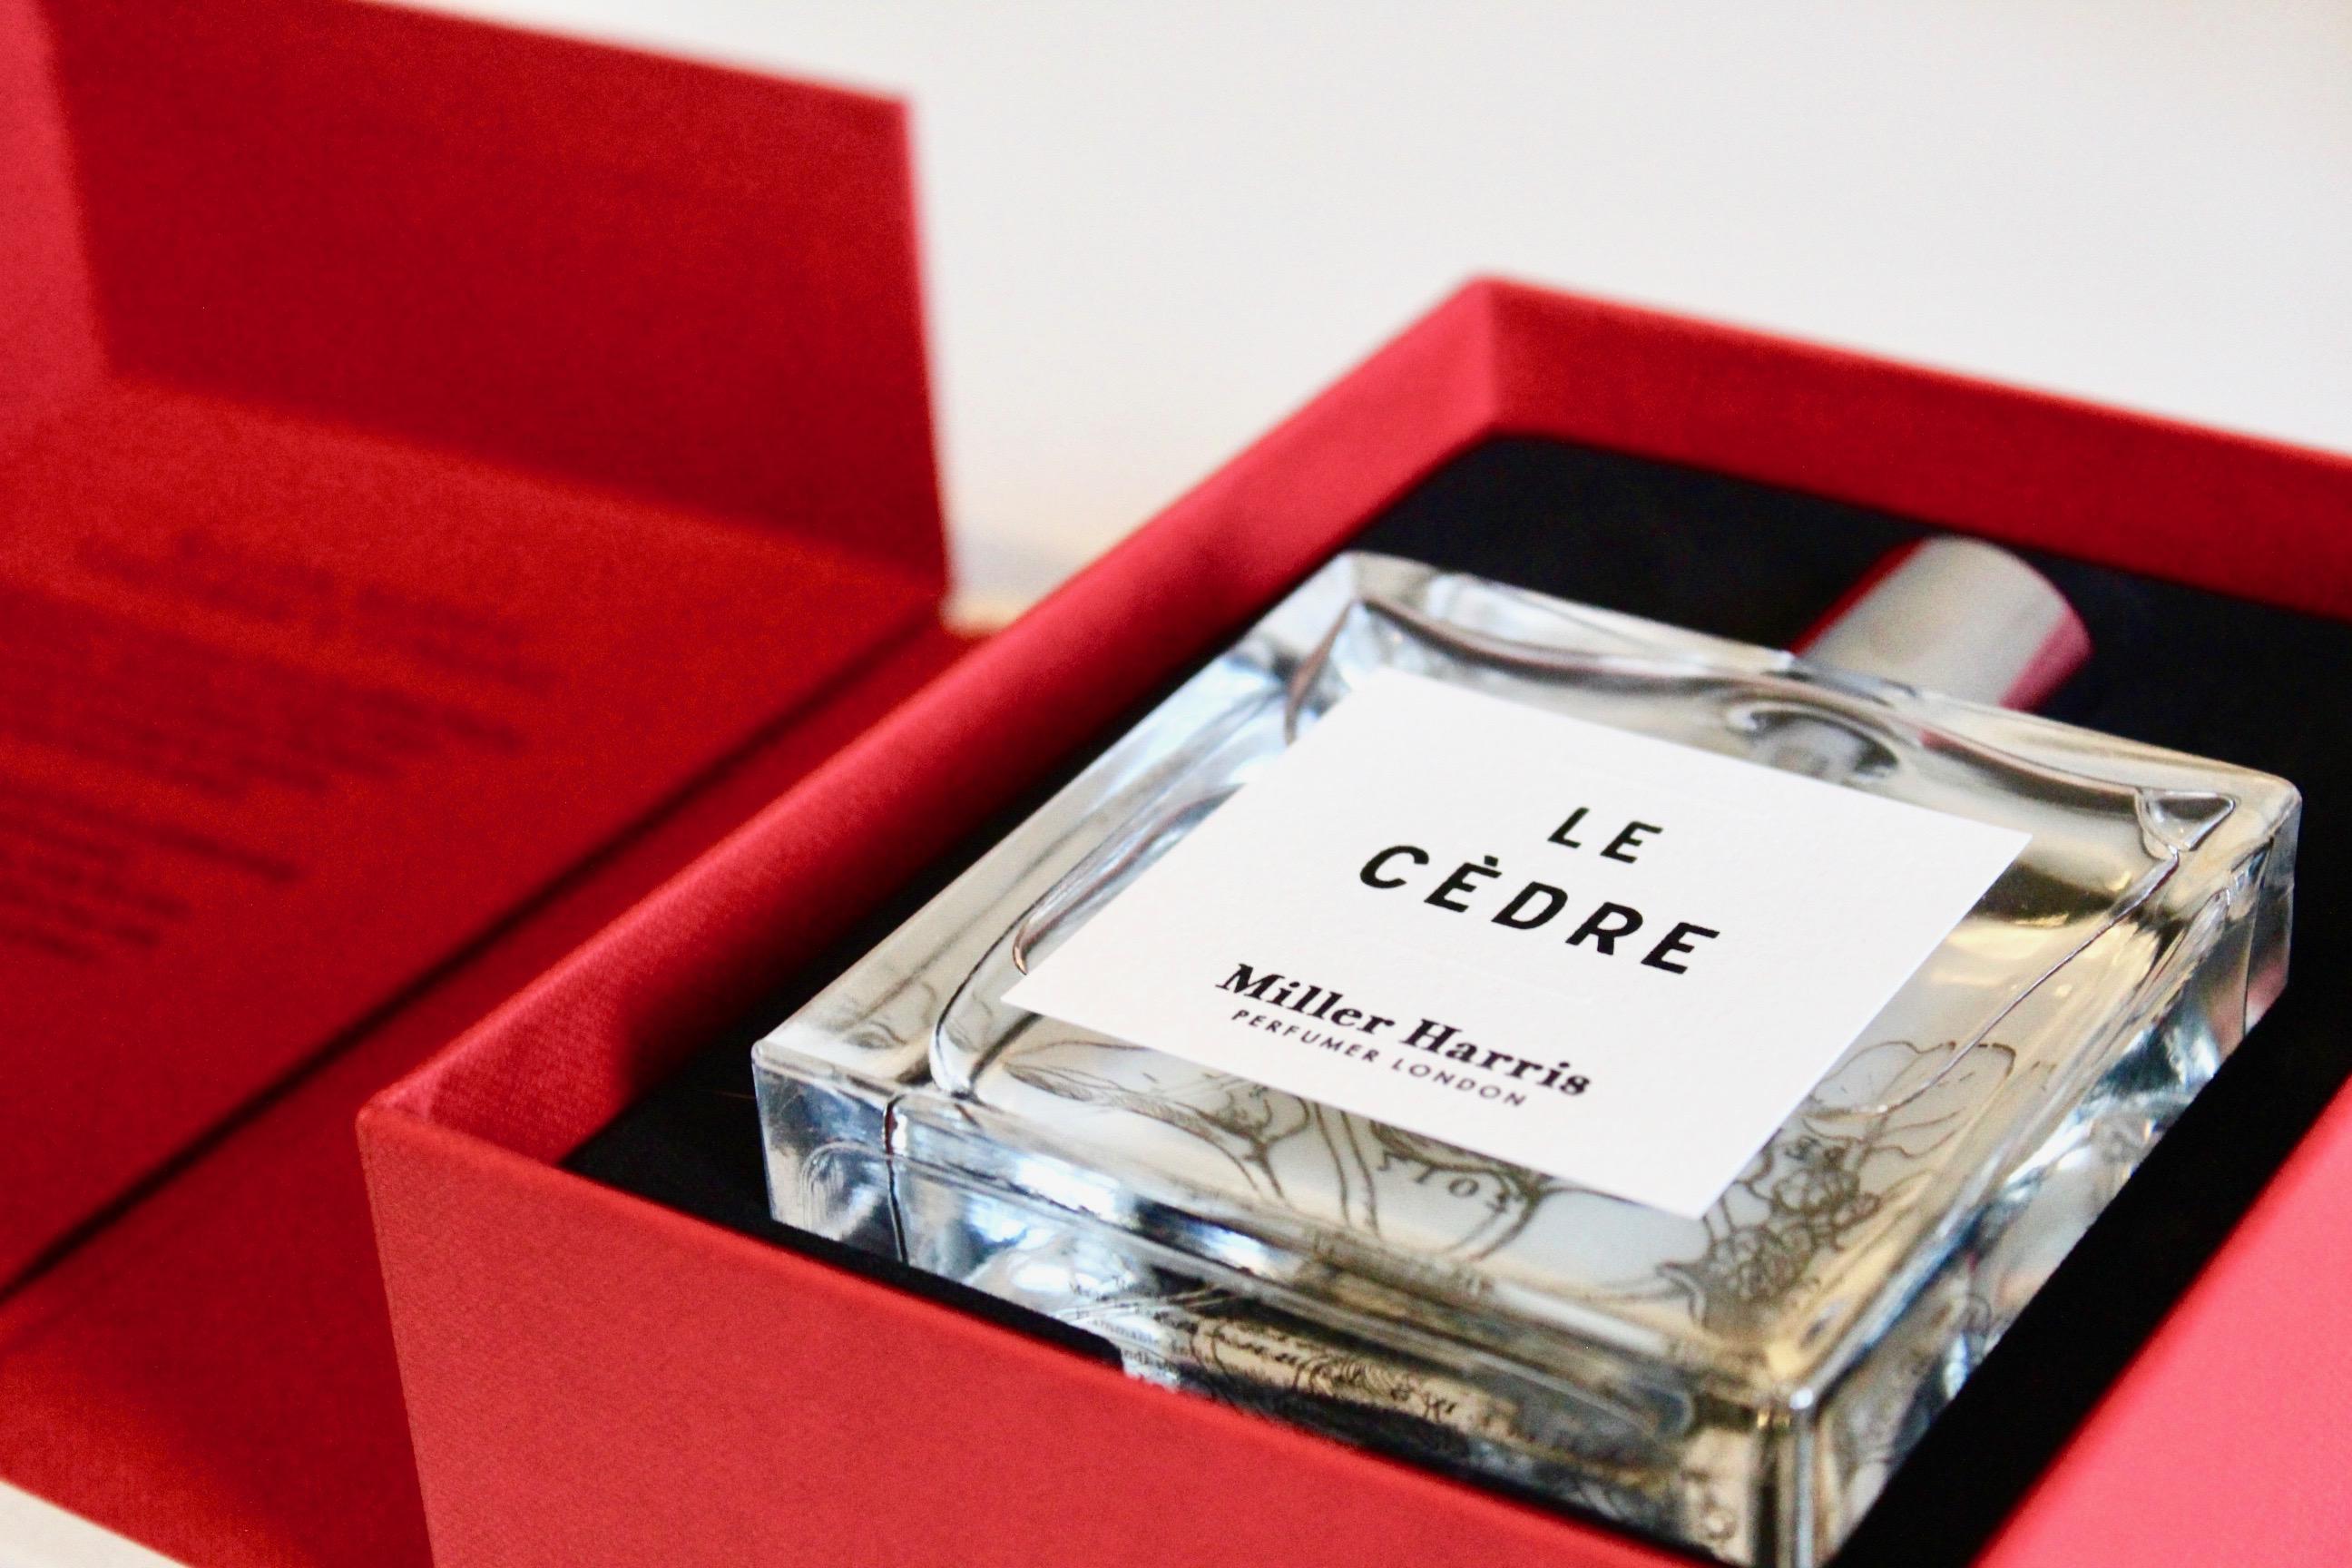 Le Cèdre by Miller Harris